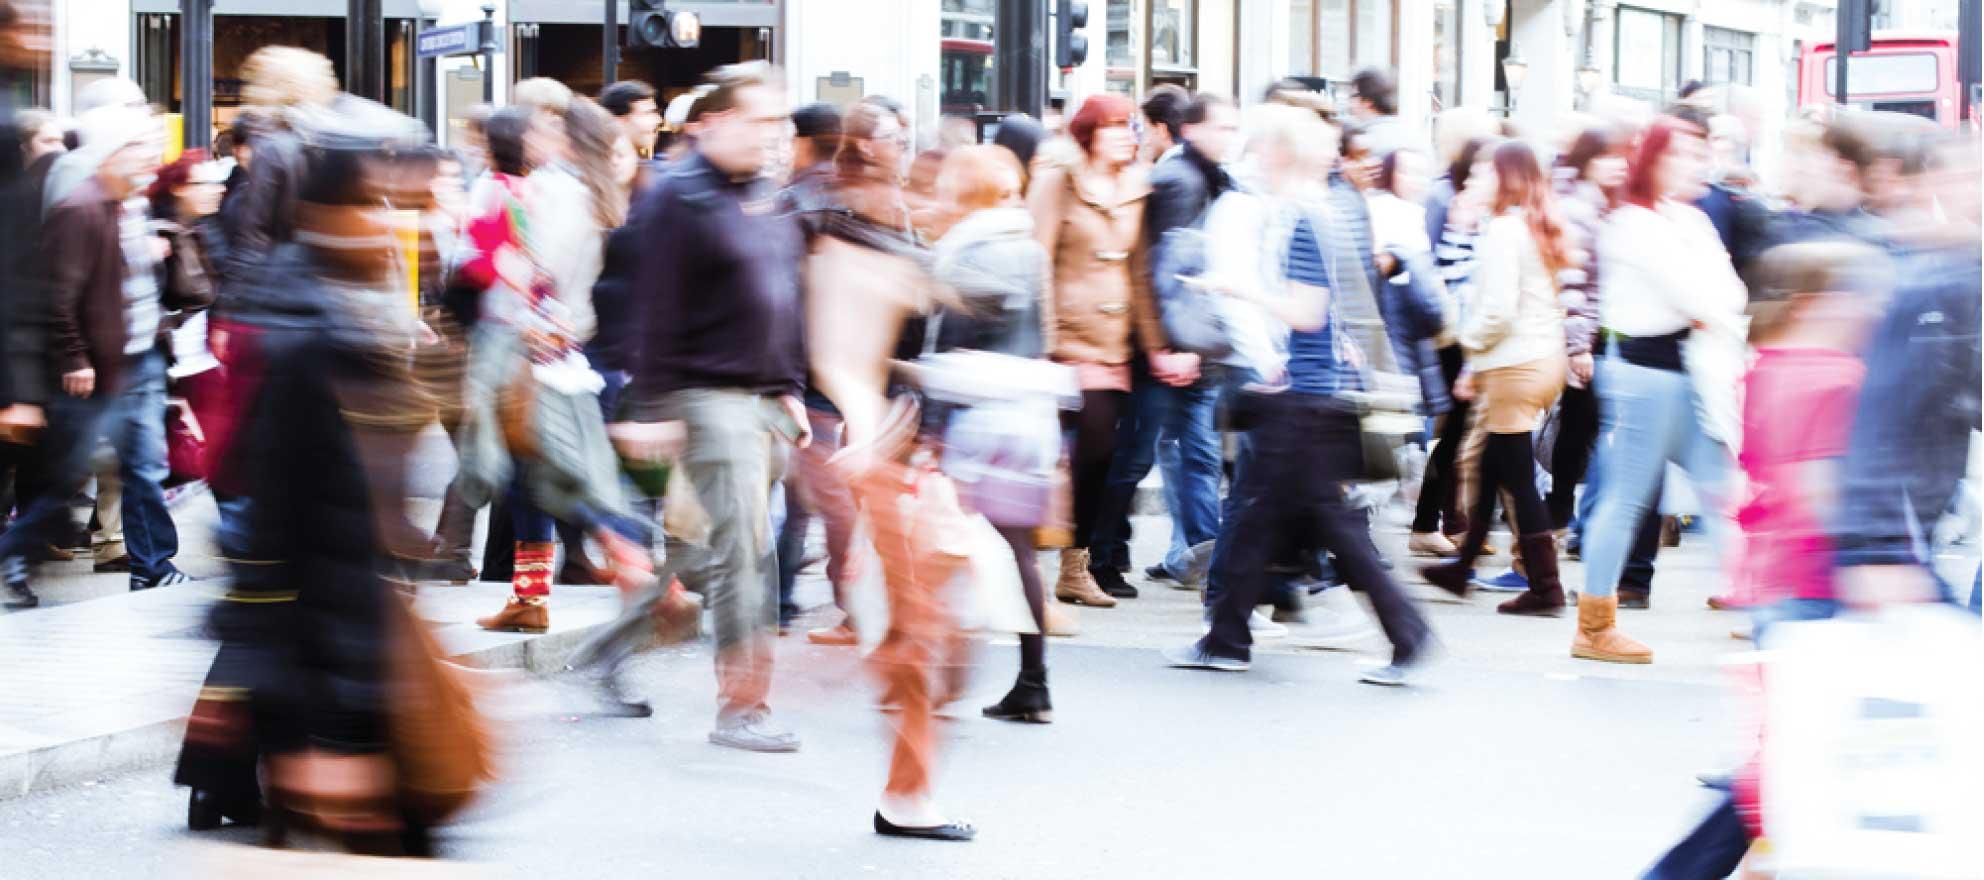 5 superb tactics for capturing local real estate traffic